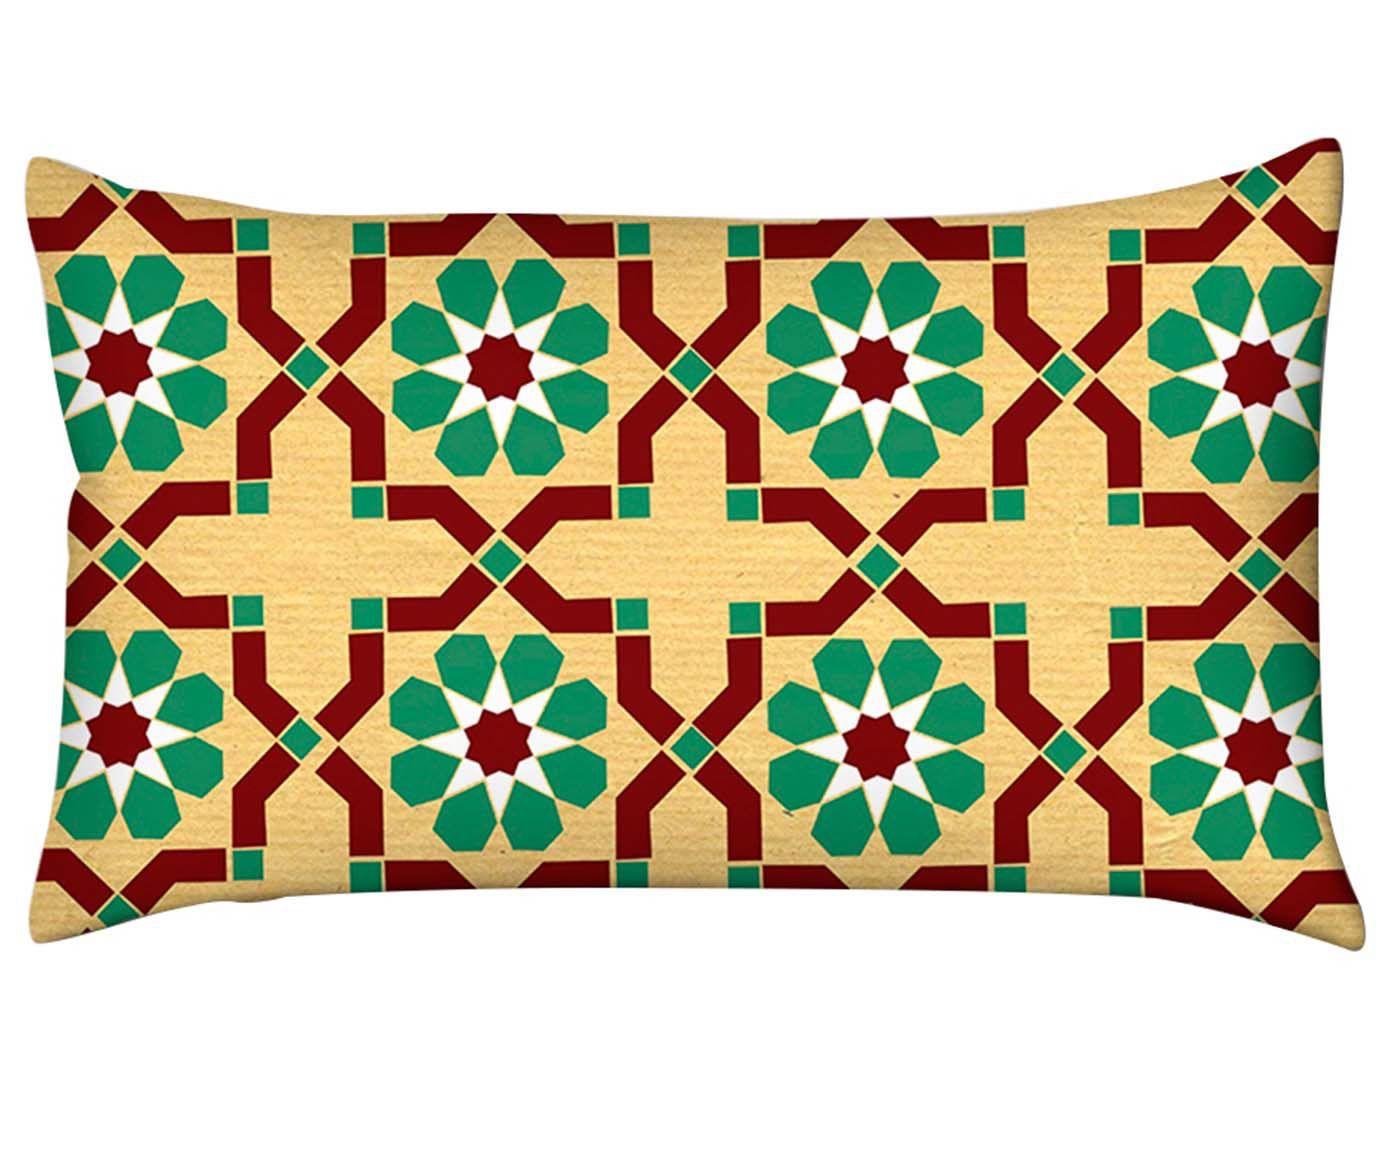 Capa para almofada marrakesh lusitan - 20 x 38 cm   Westwing.com.br